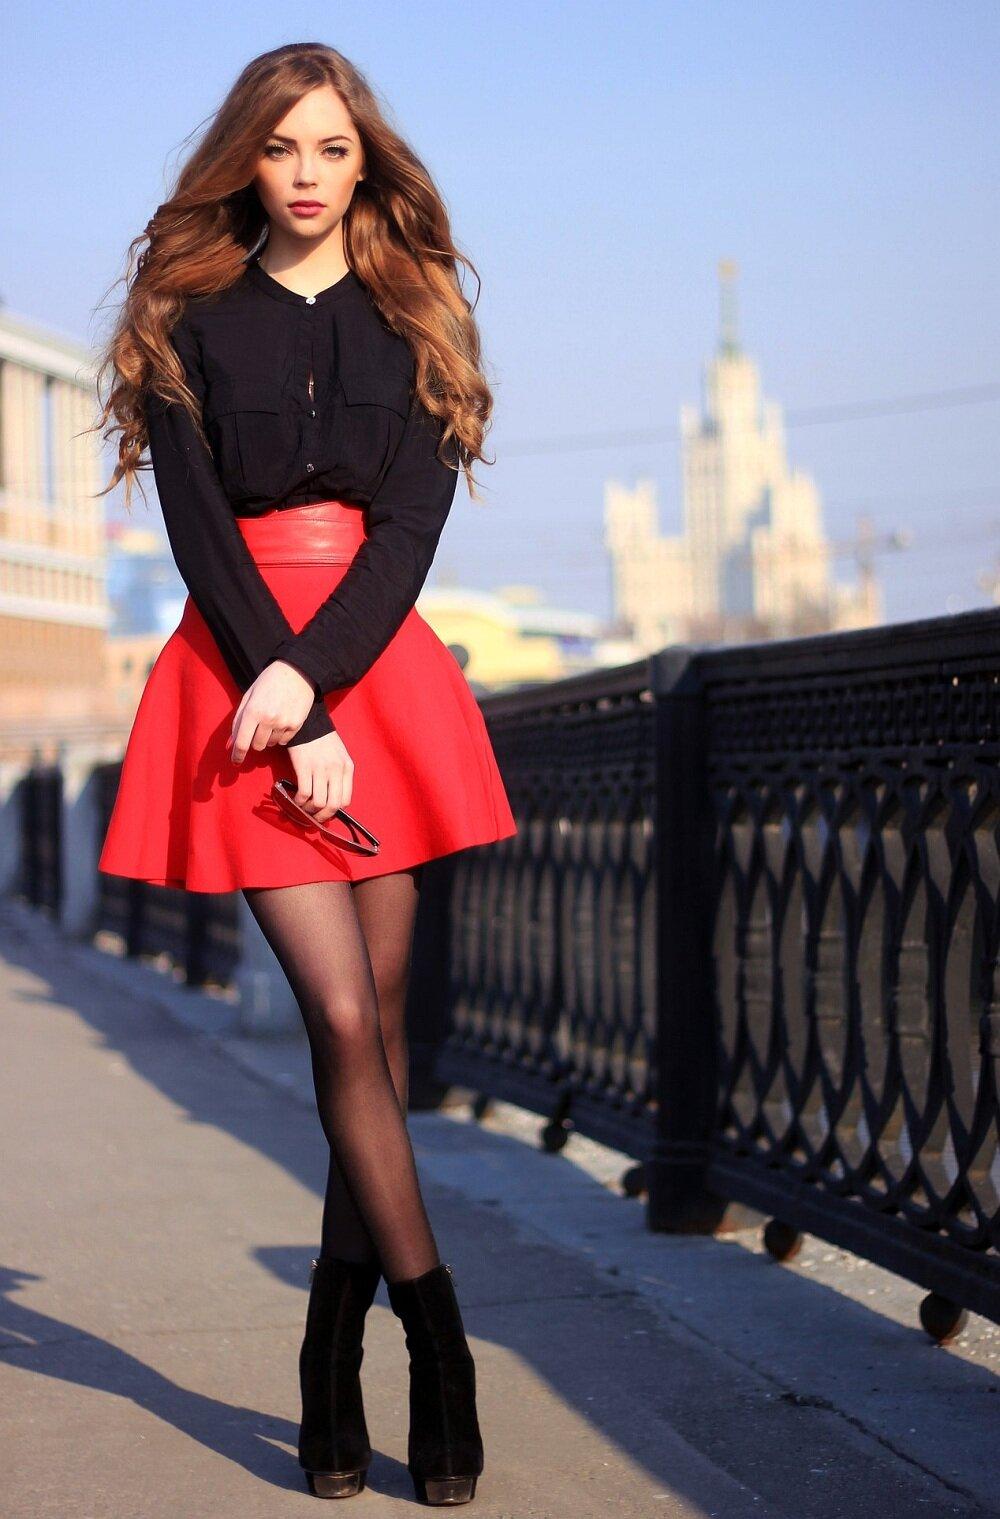 девушка в юбке фотогалерея руками развожу свою